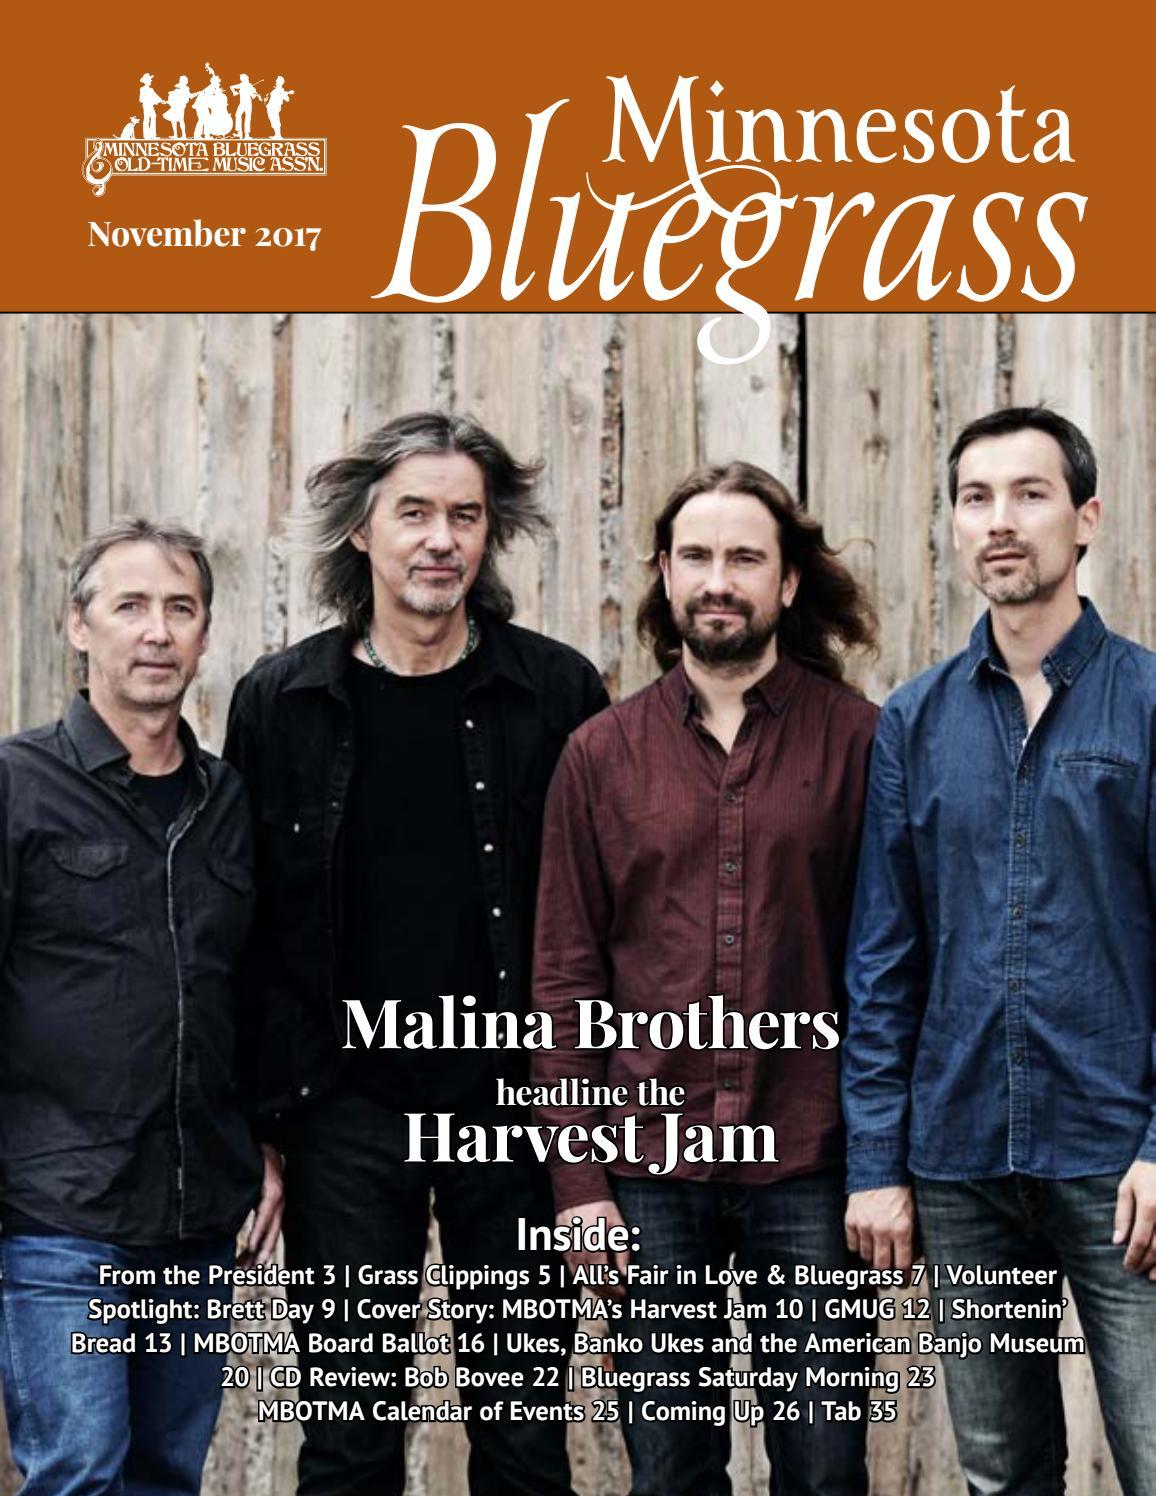 Minnesota bluegrass magazine november 2017 by minnesota bluegrass minnesota bluegrass magazine november 2017 by minnesota bluegrass issuu hexwebz Gallery